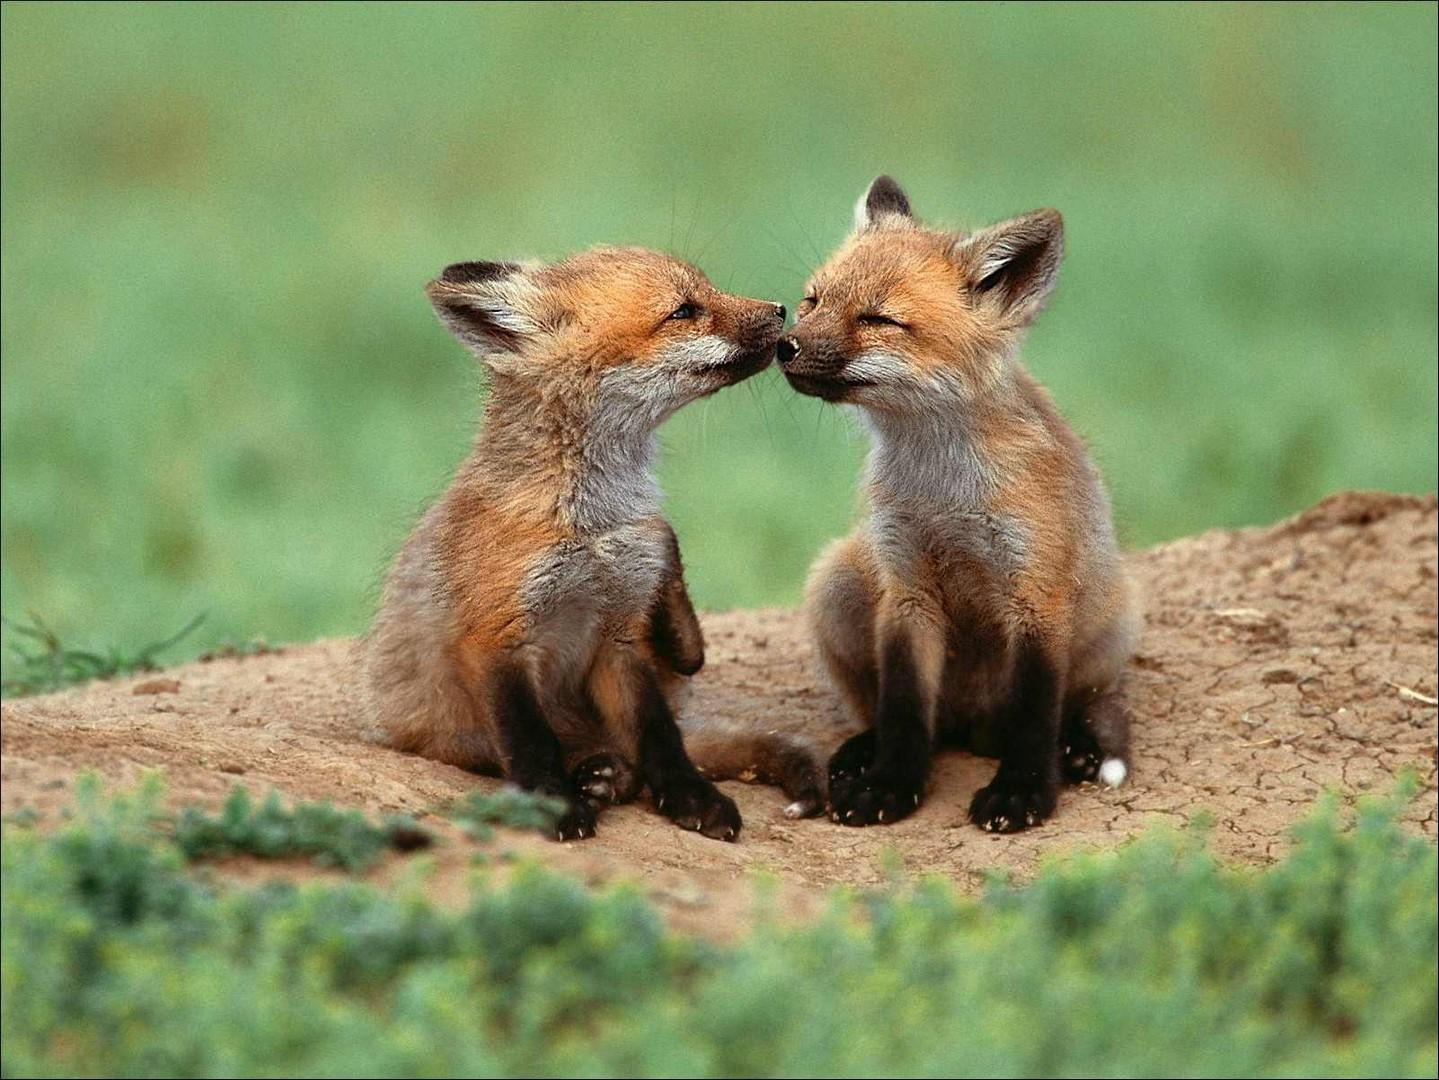 Fondos Animados Para Celular De Animales: Fondos De Pantalla De Animales Tiernos